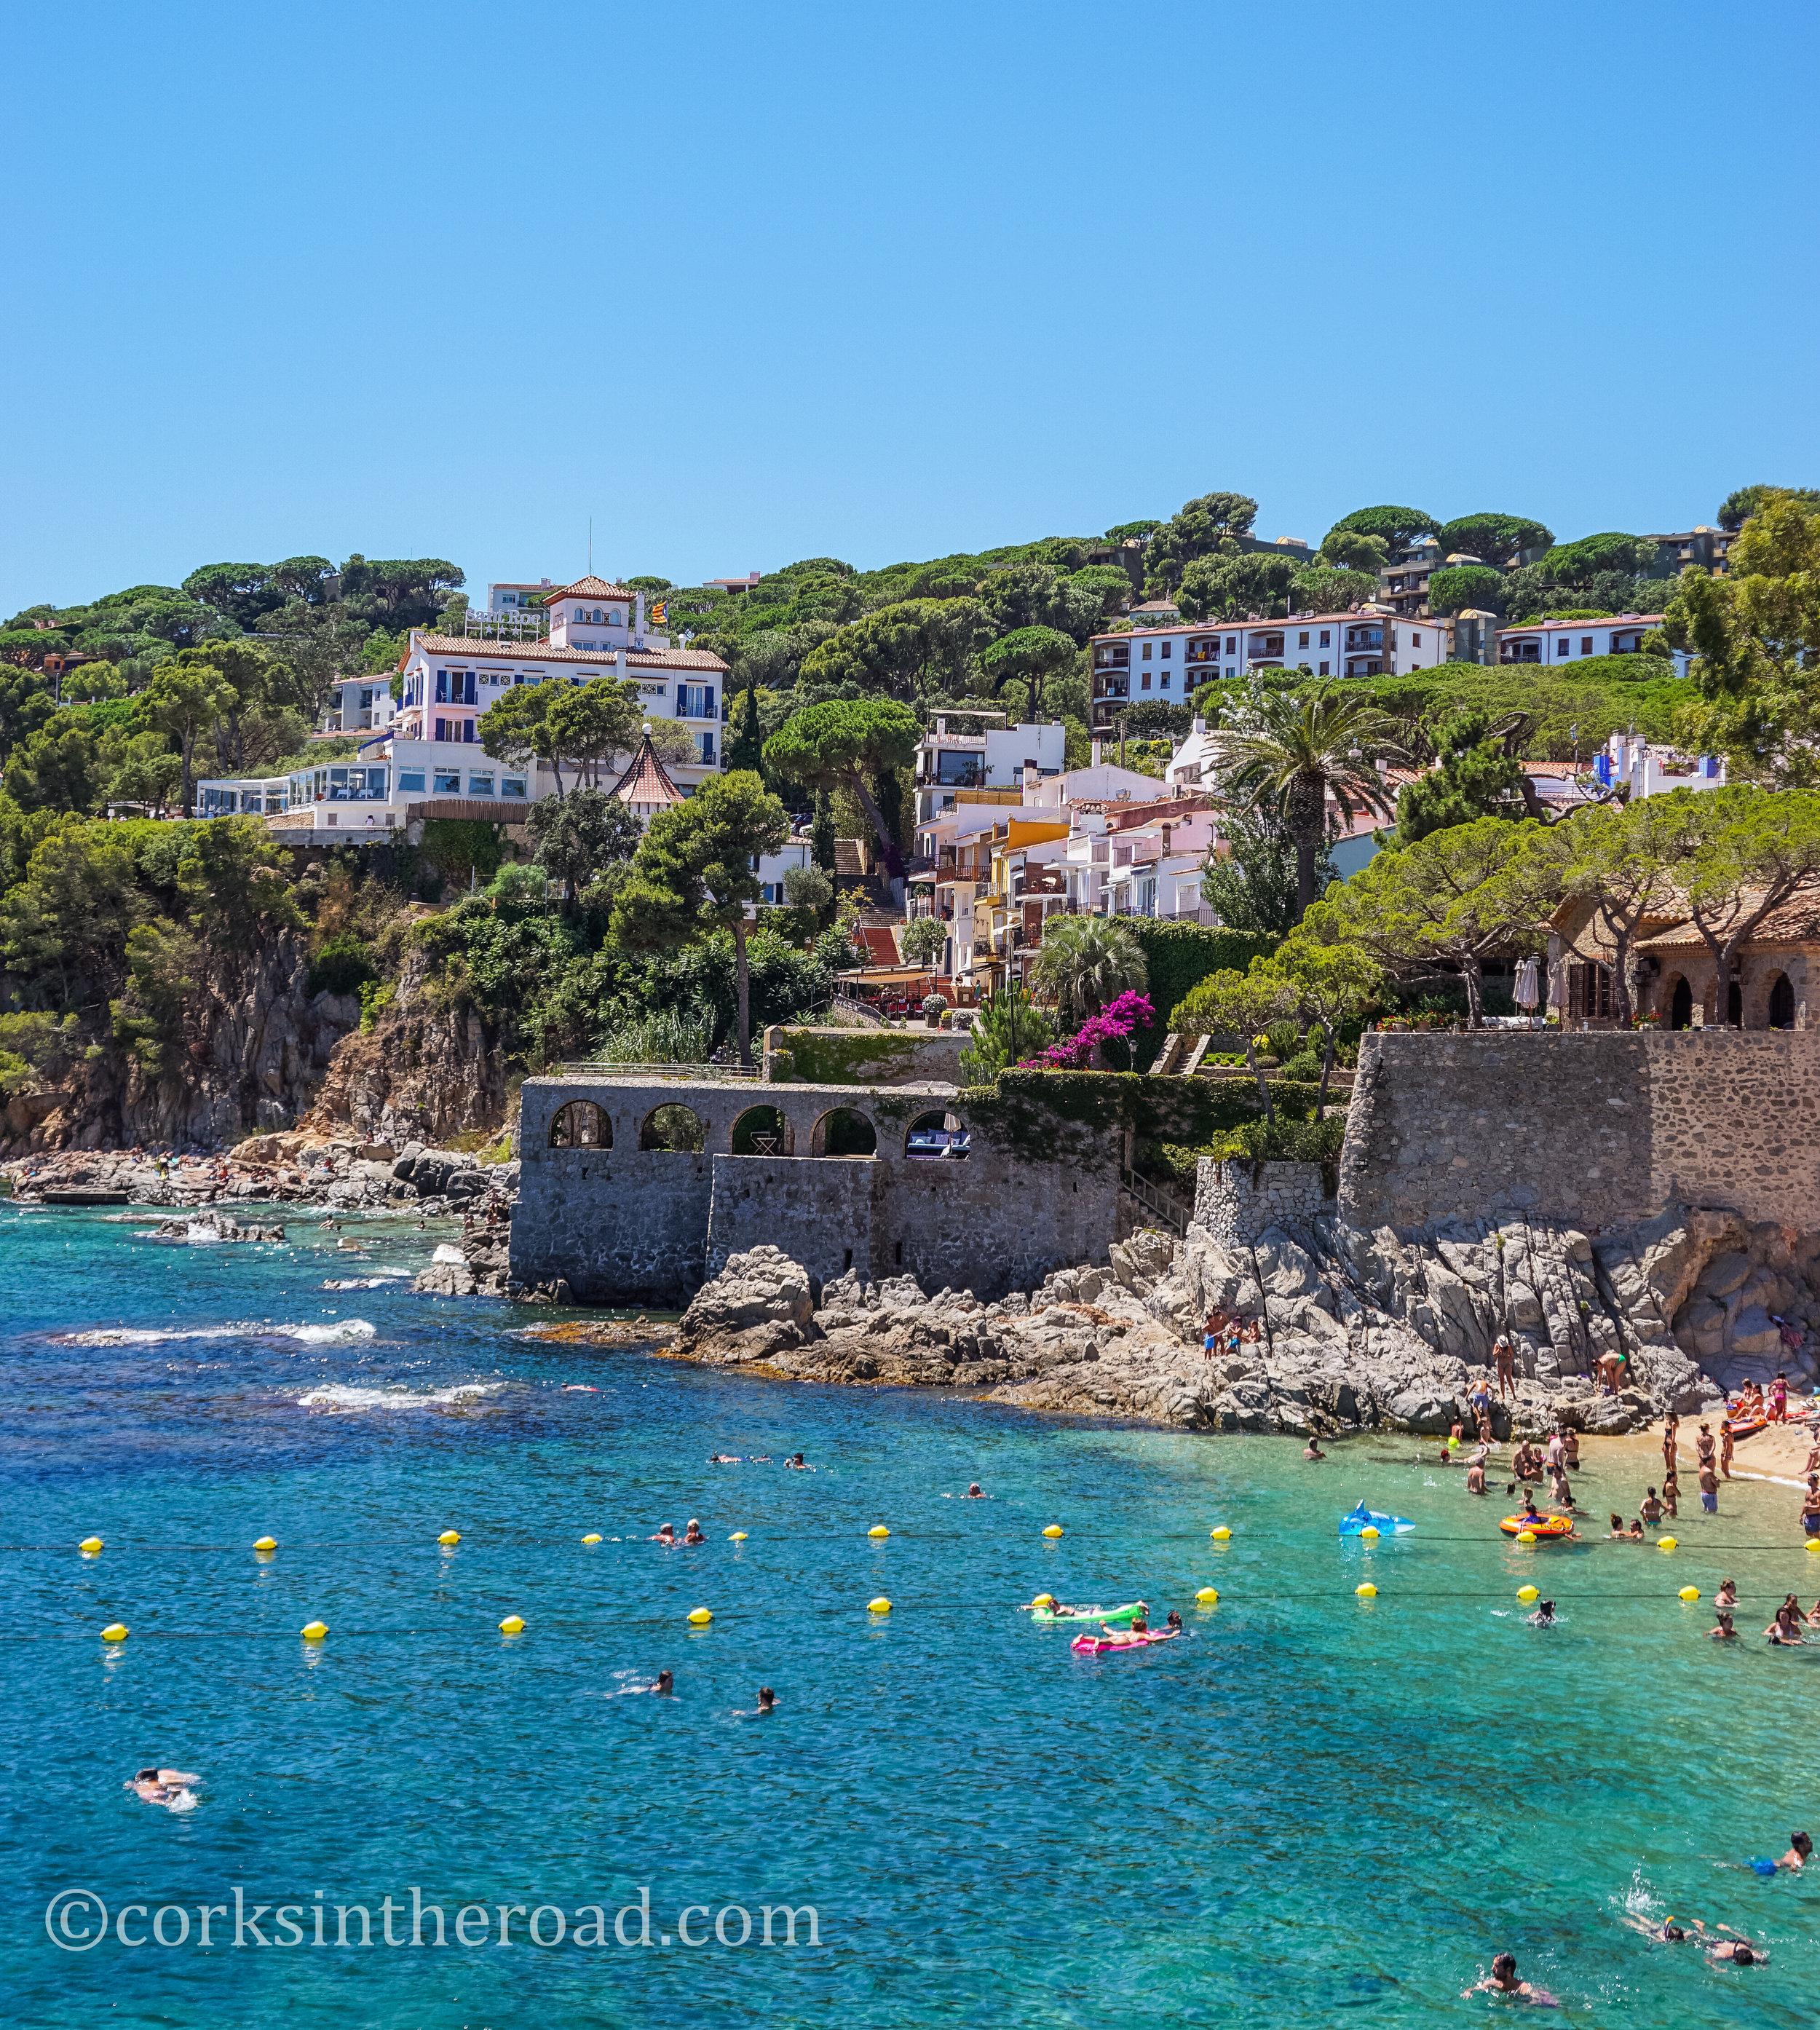 20160807Barcelona, Beaches, Corksintheroad, Costa Brava, Costa Brava Landscape-7.jpg